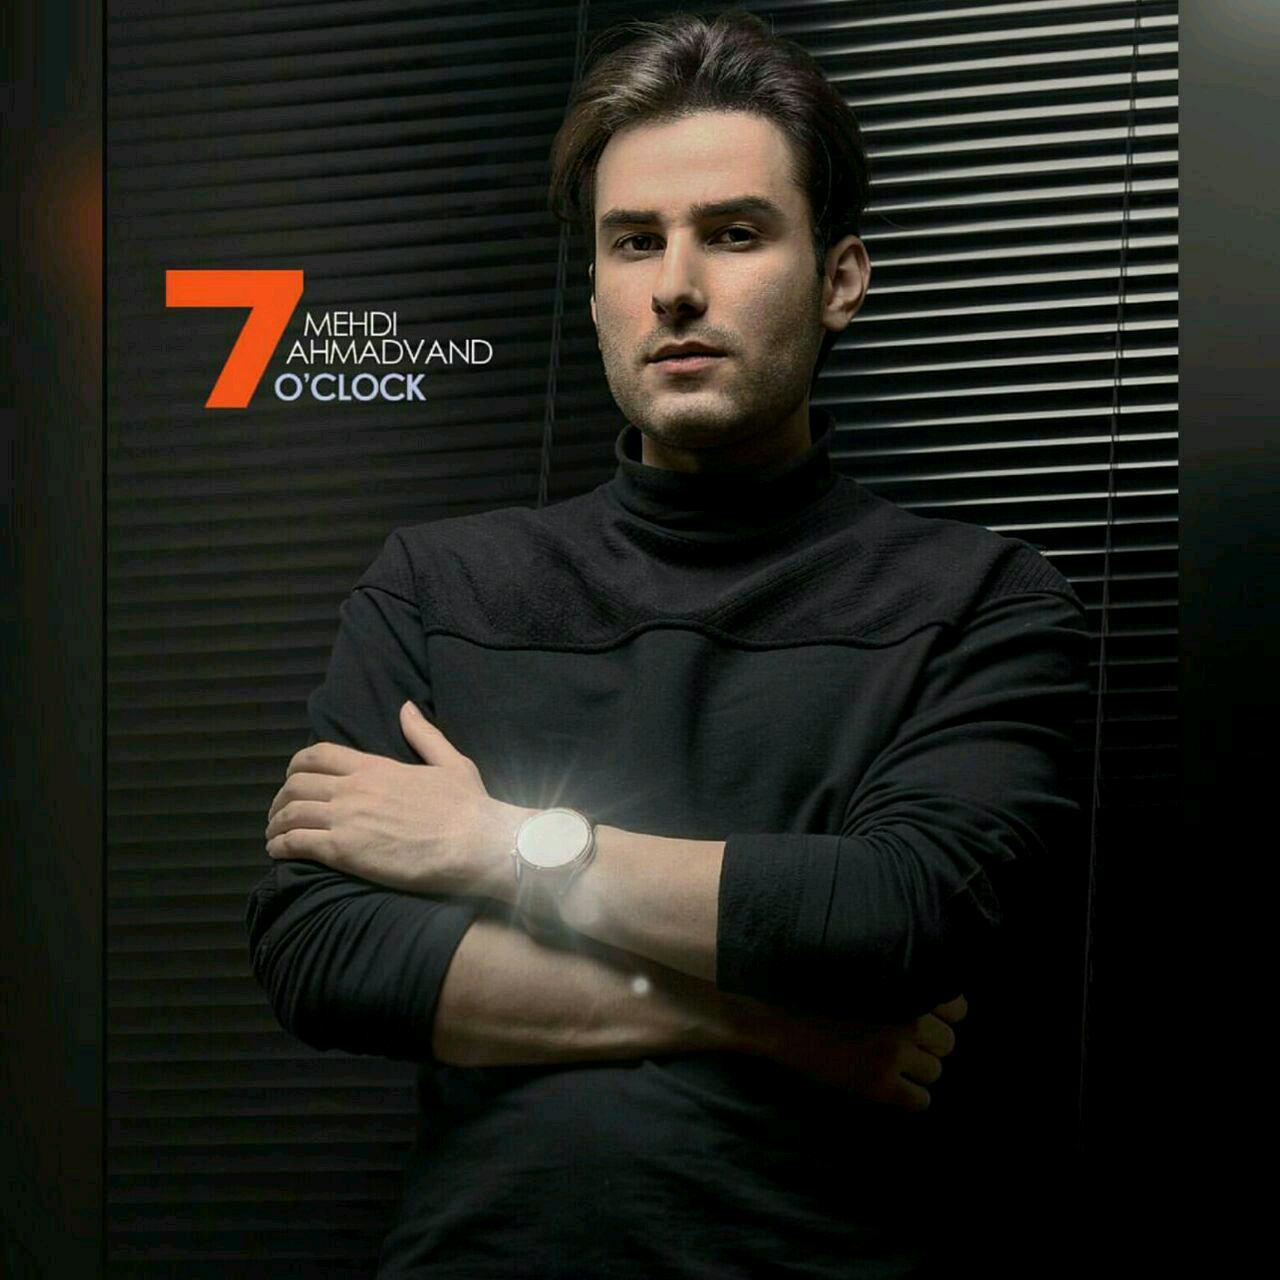 Mehdi Ahmadvand – Saat 7 (Demo Album)